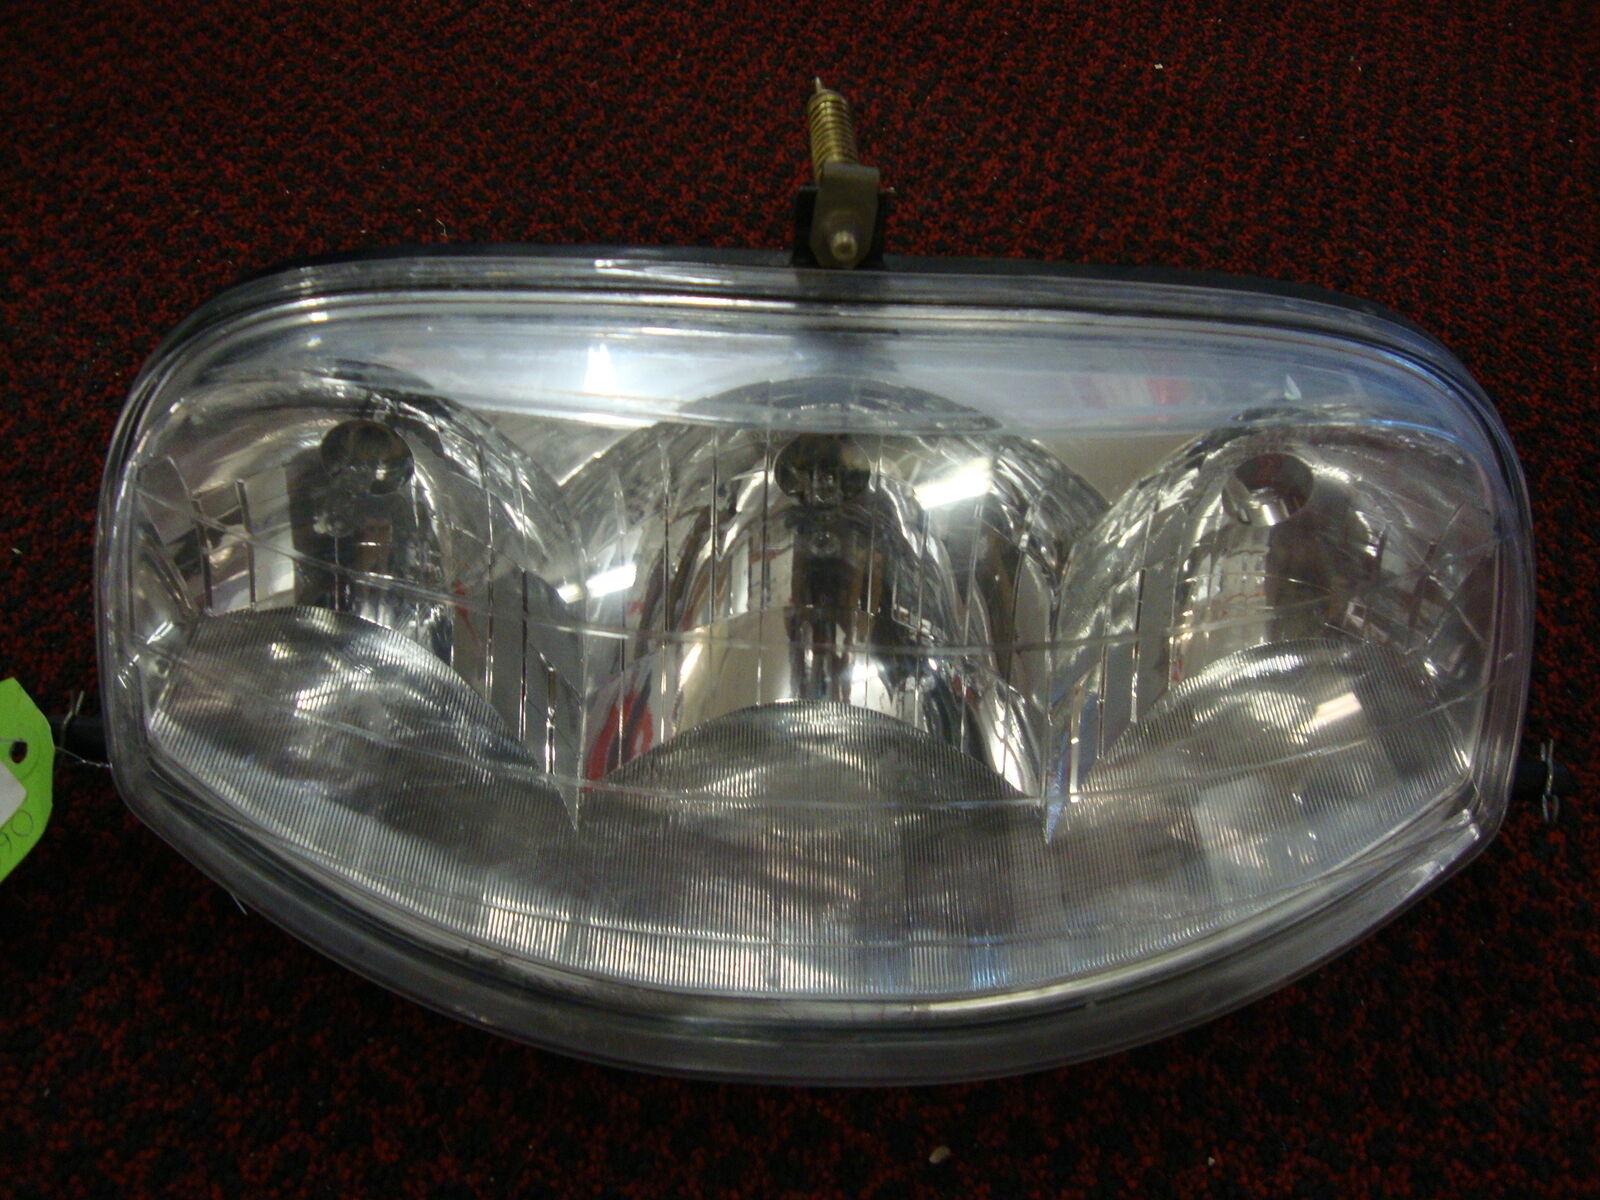 2002 Arctic Cat Z 570 FRONT HEAD LIGHT LAMP HEADLIGHT 0609-250